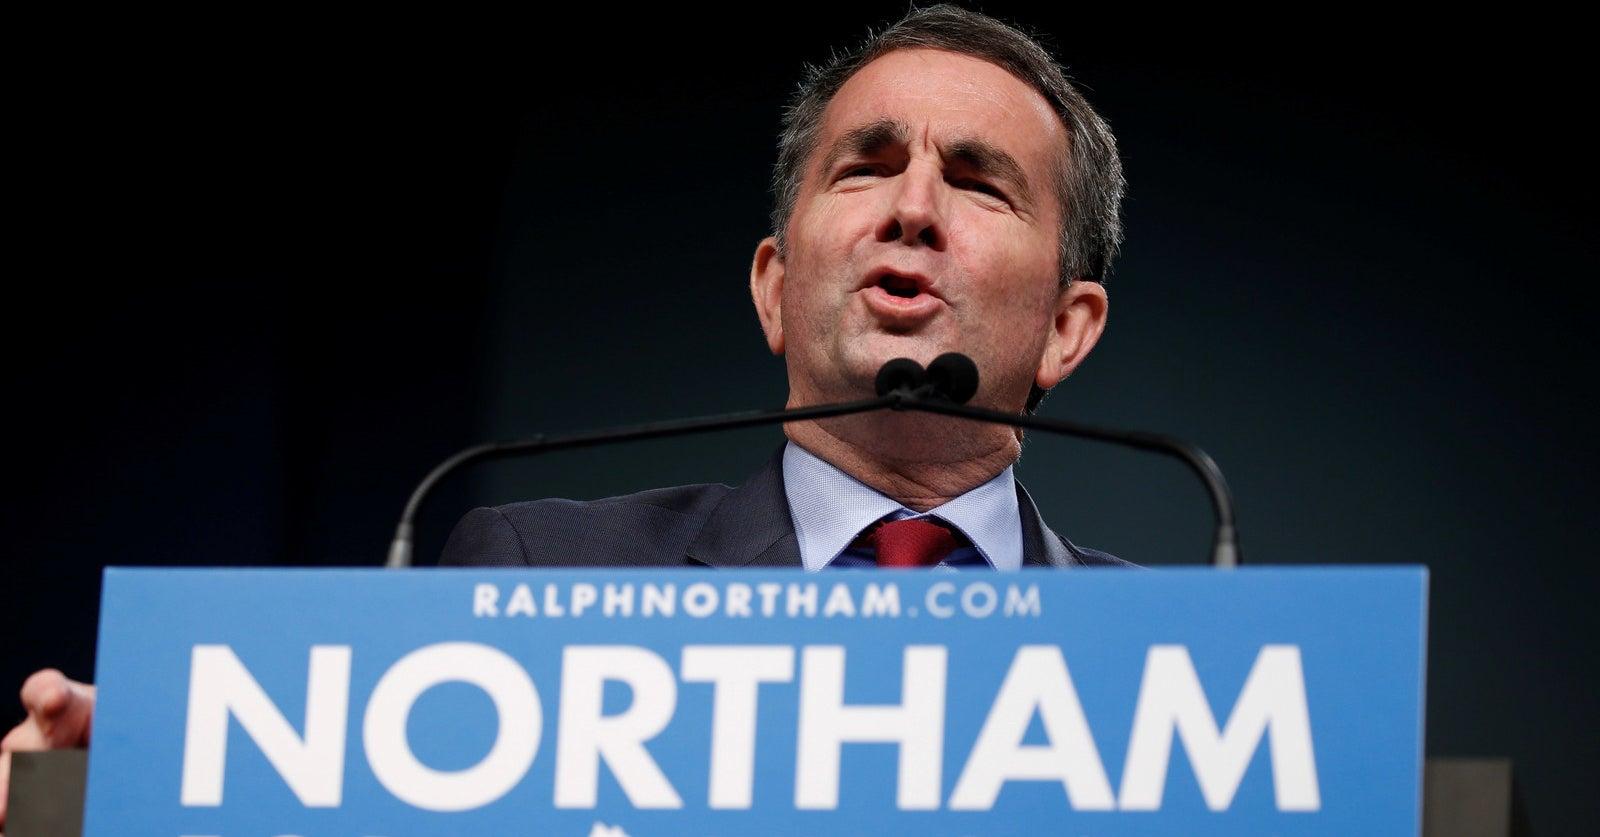 Democrat Ralph Northam Wins Contentious Virginia Governor ...